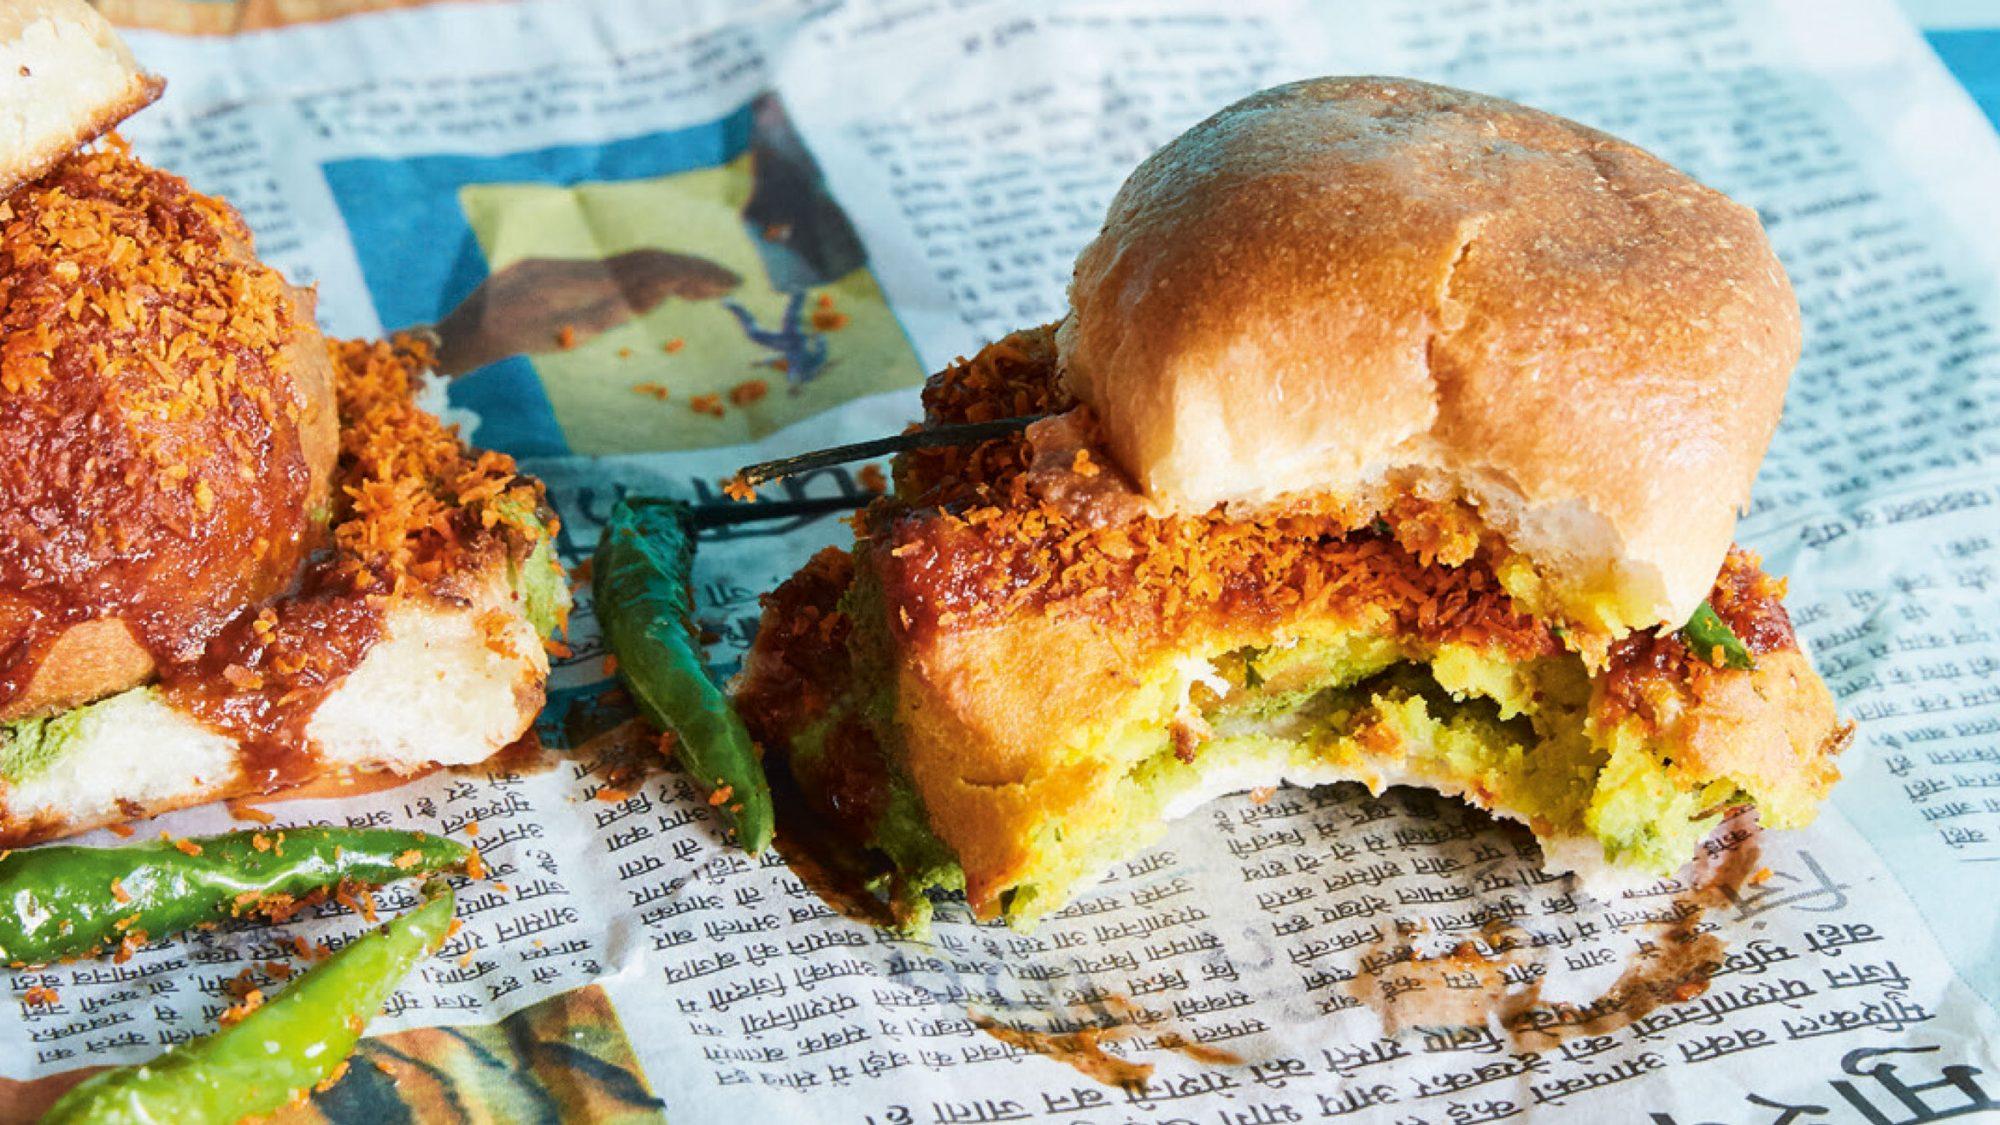 Article-How-to-Use-Asafetida-Vada-Pav-Potato-Fritter-Sandwich-Recipe